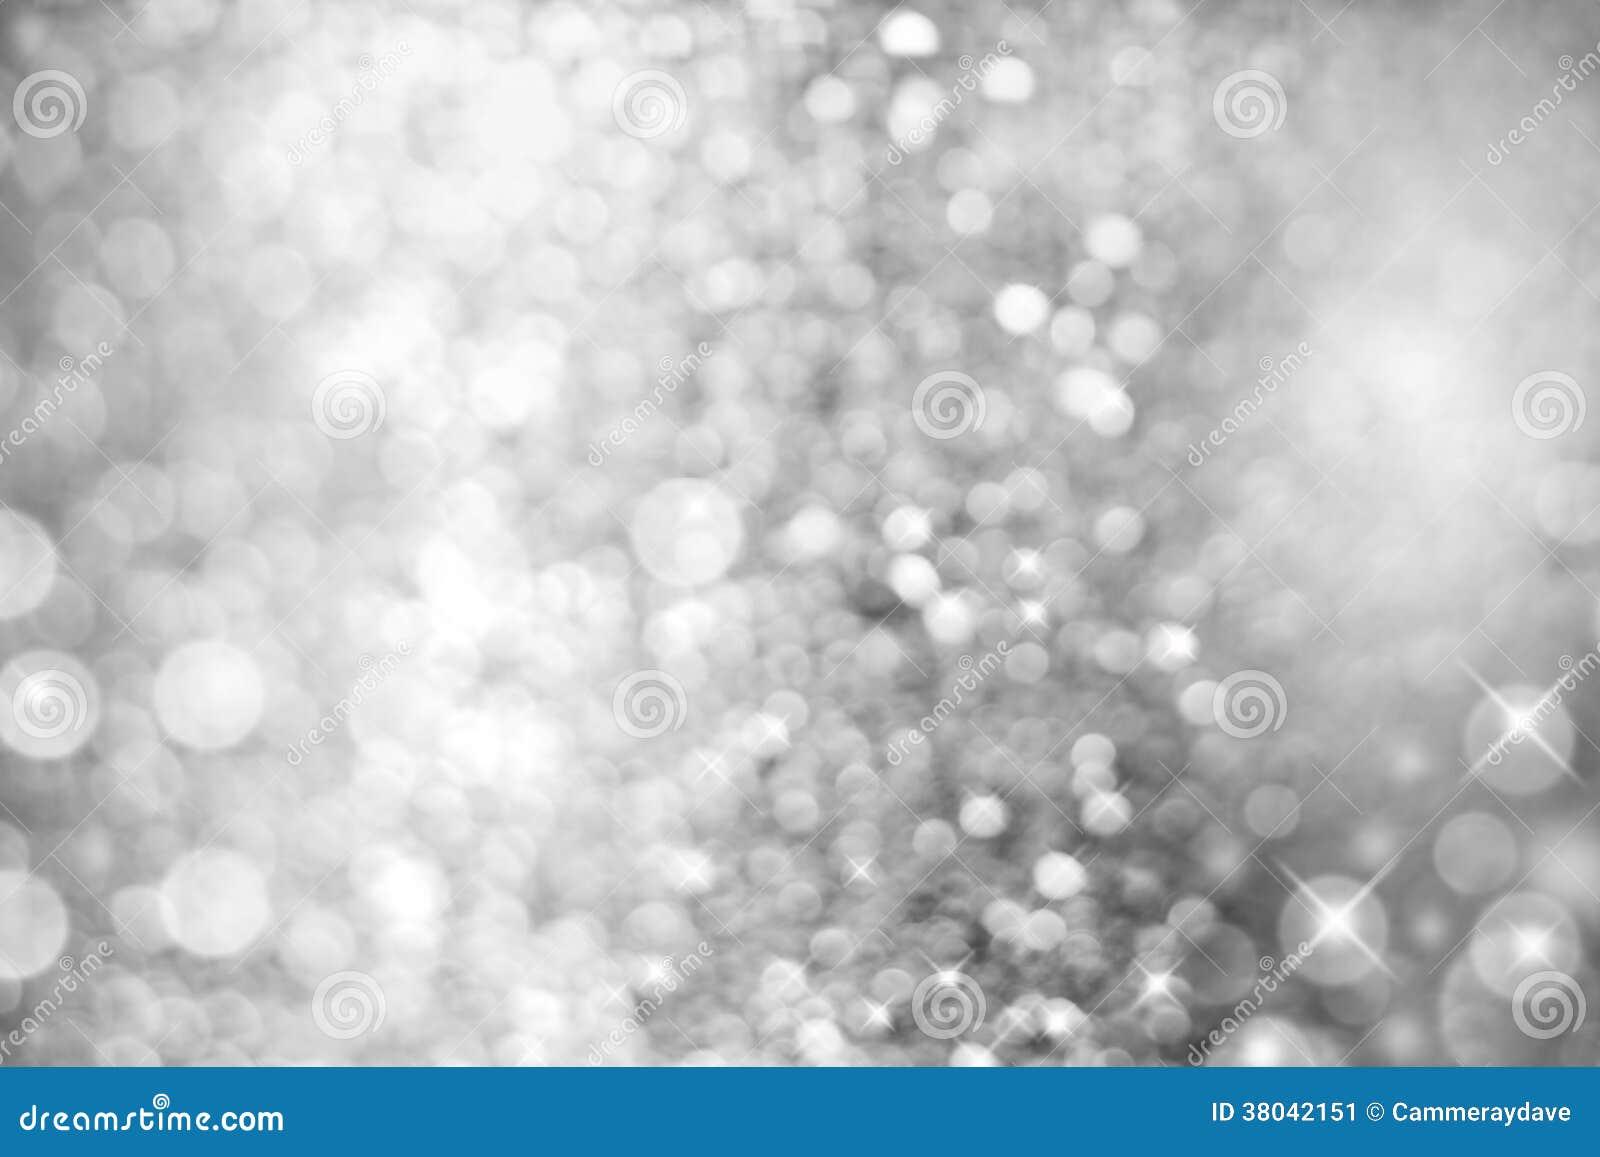 Fundo abstrato branco prateado